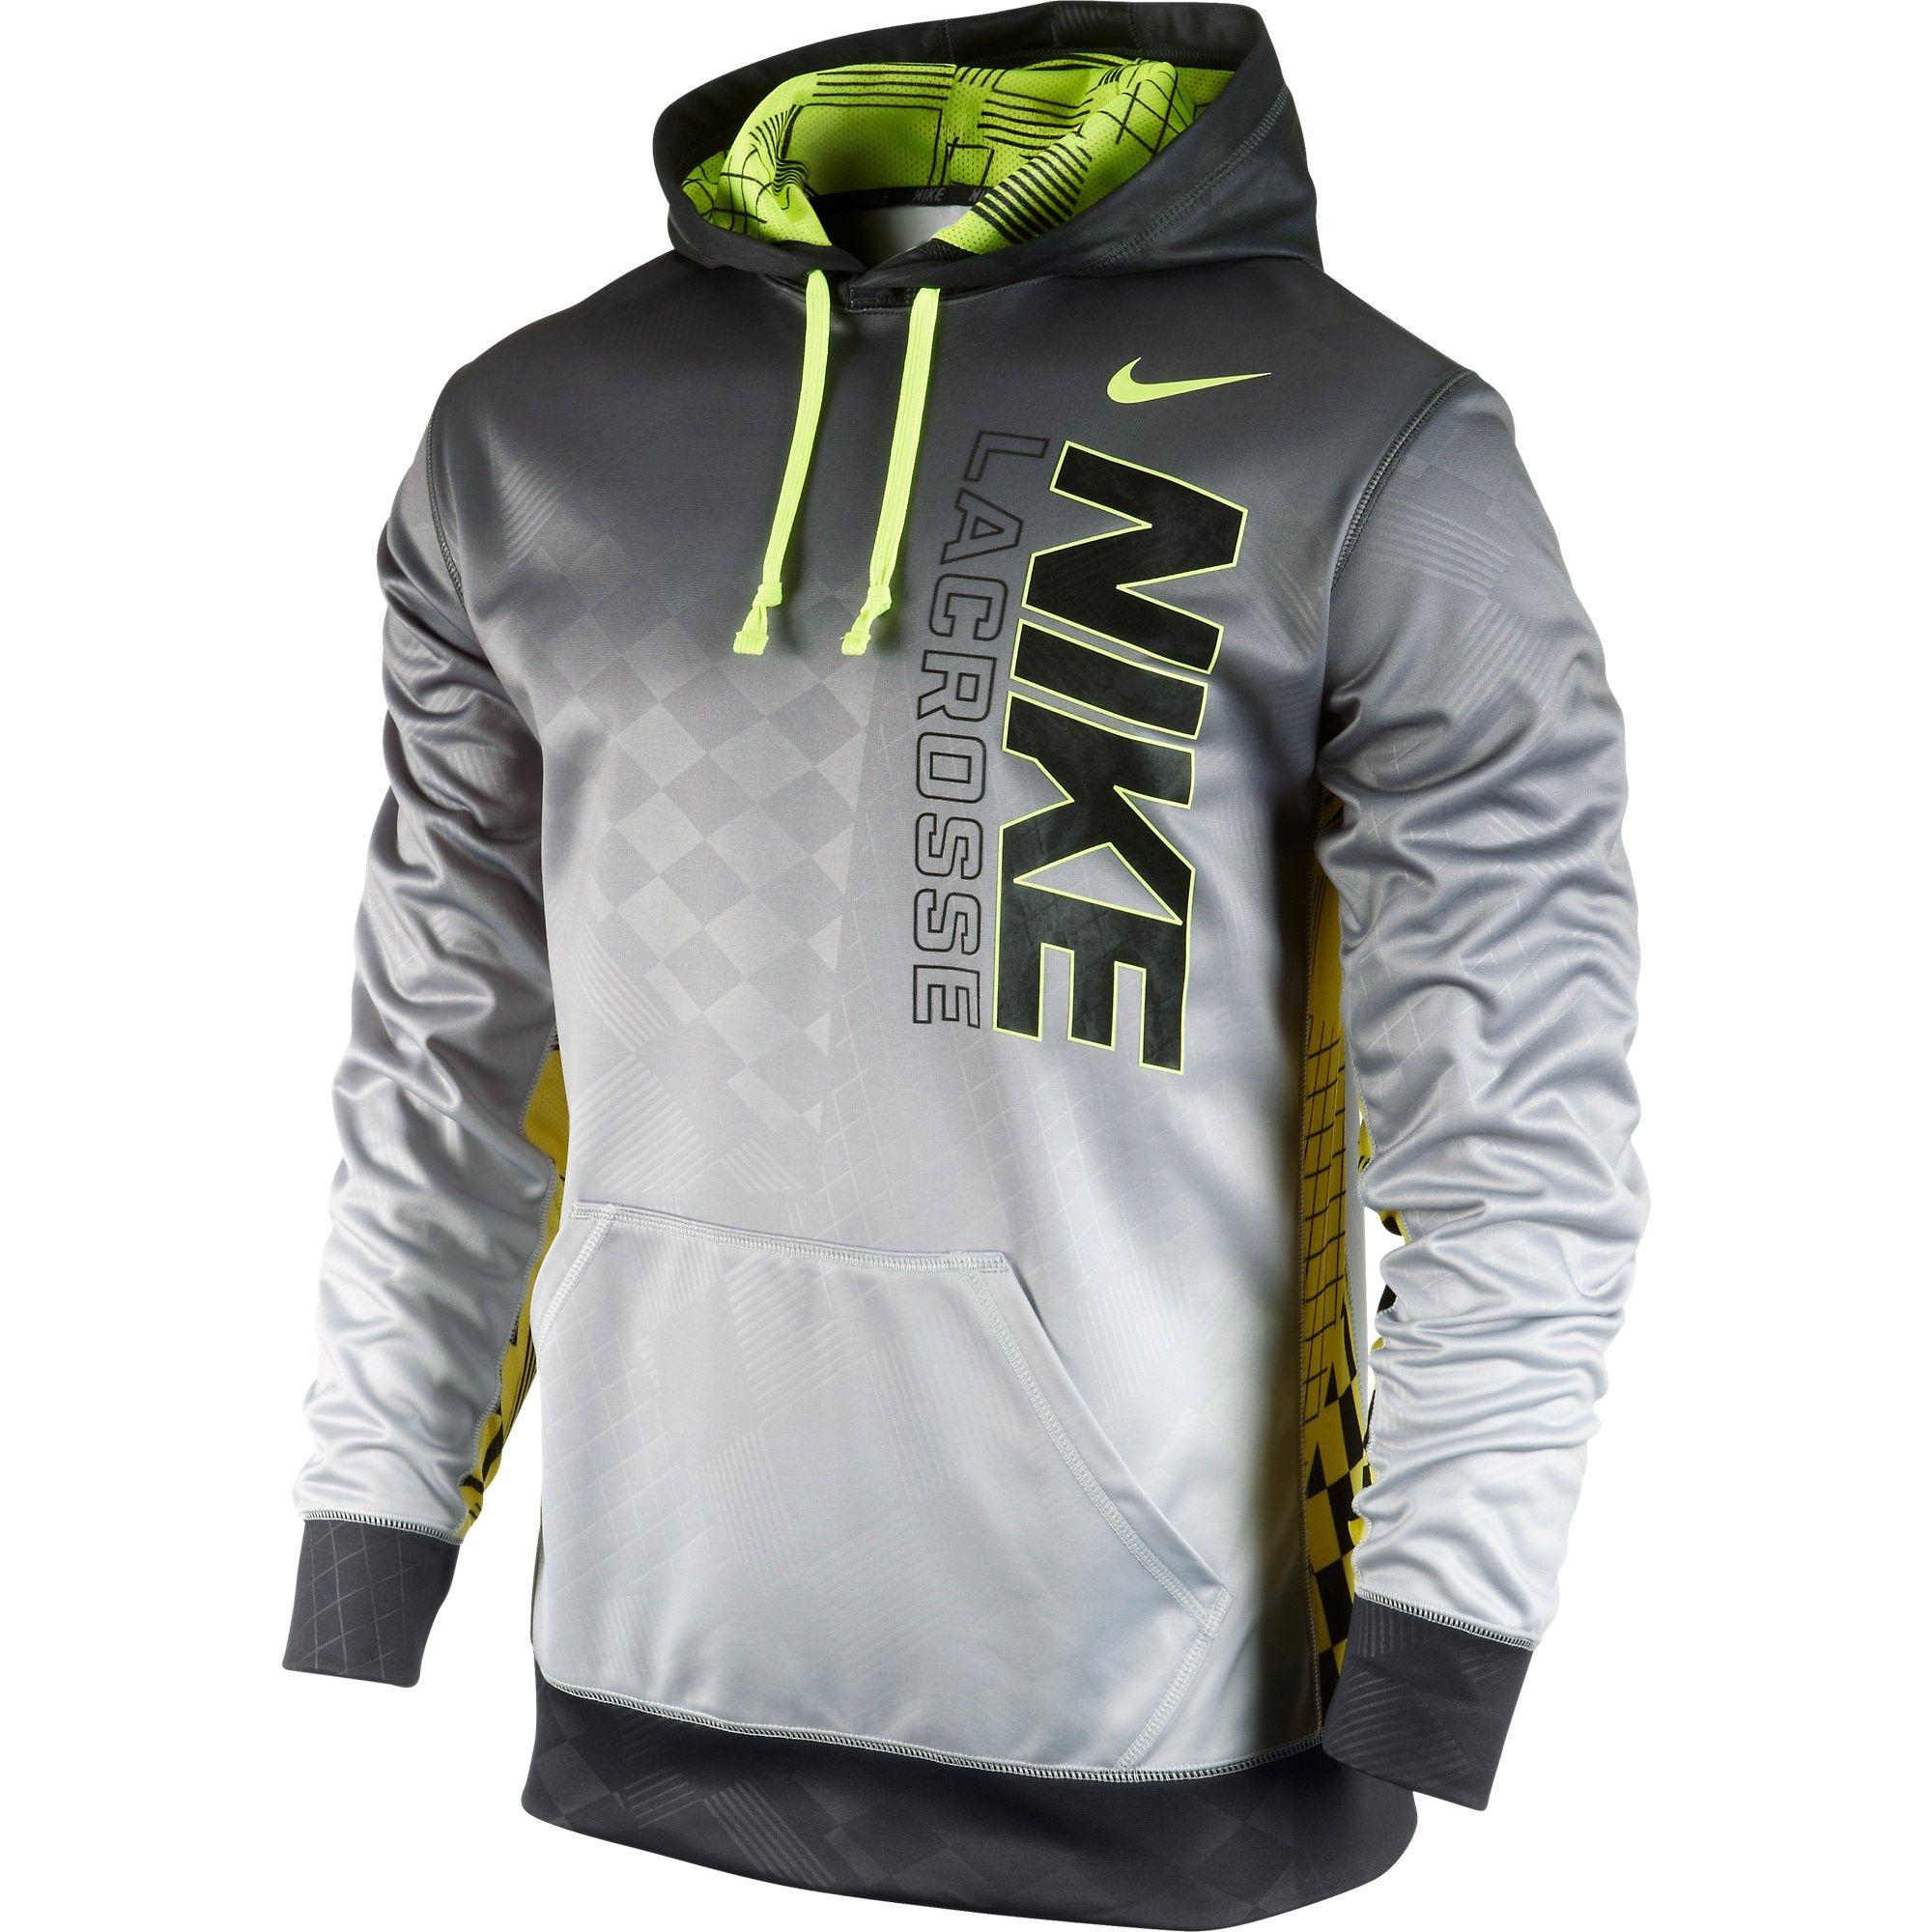 Nike Lacrosse Apparel & Clothing | T-Shirts, Shorts & More | Lax World. Nike  PulloverNike Sweatshirts HoodieNike HoodieMen's ...